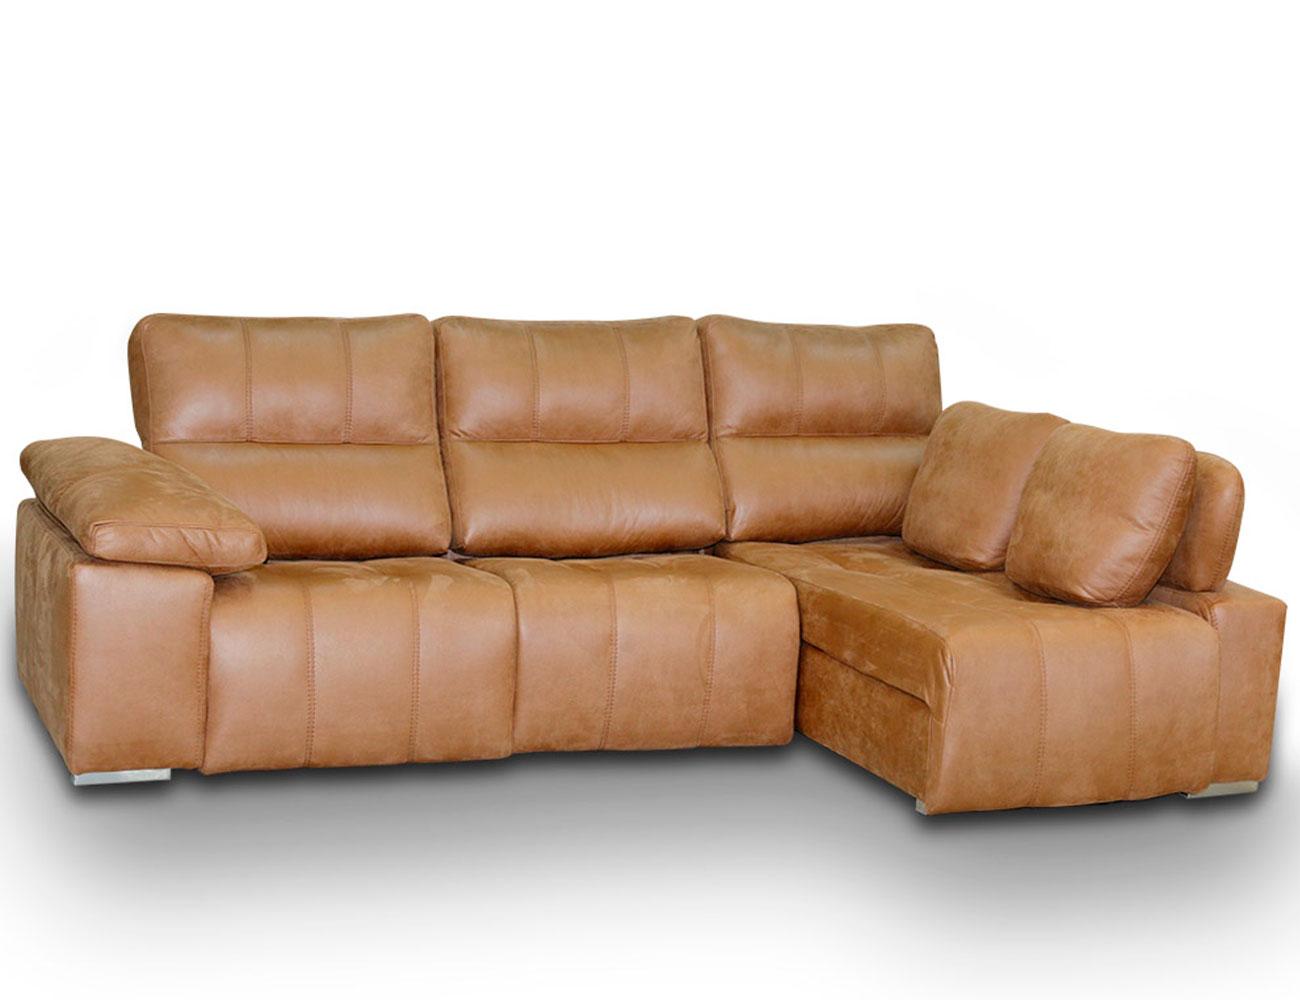 Sofa chaiselongue relax 2 motores anti manchas6